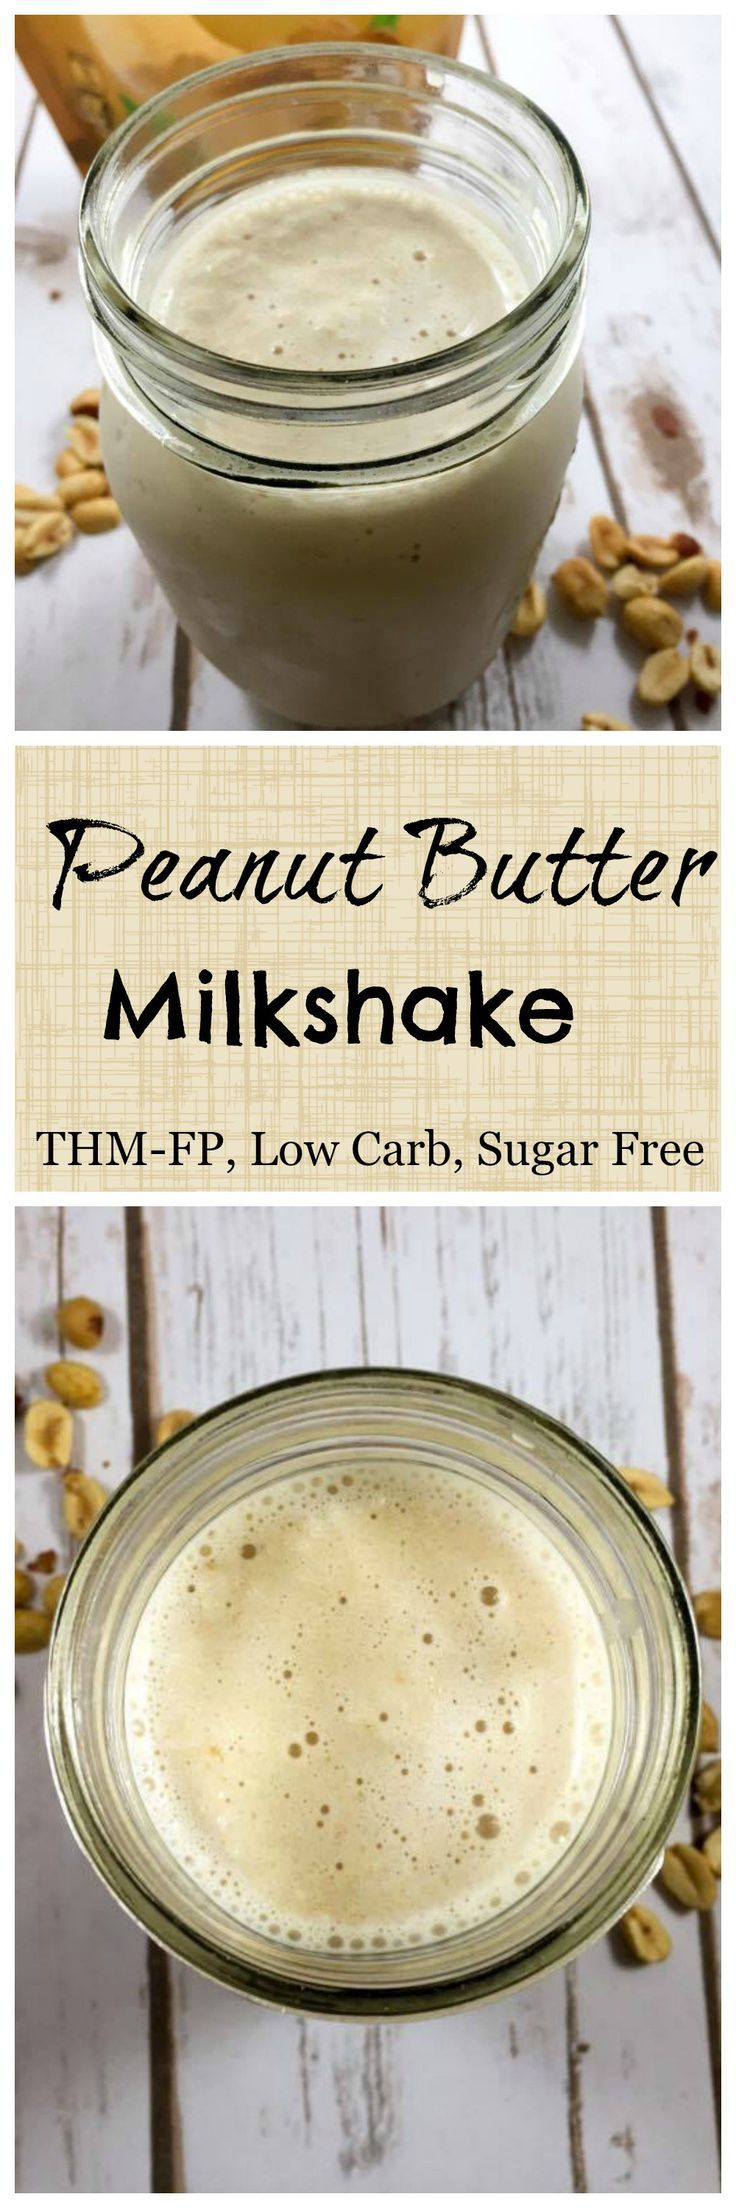 low-carb-peanut-butter-milkshake-sugar-free